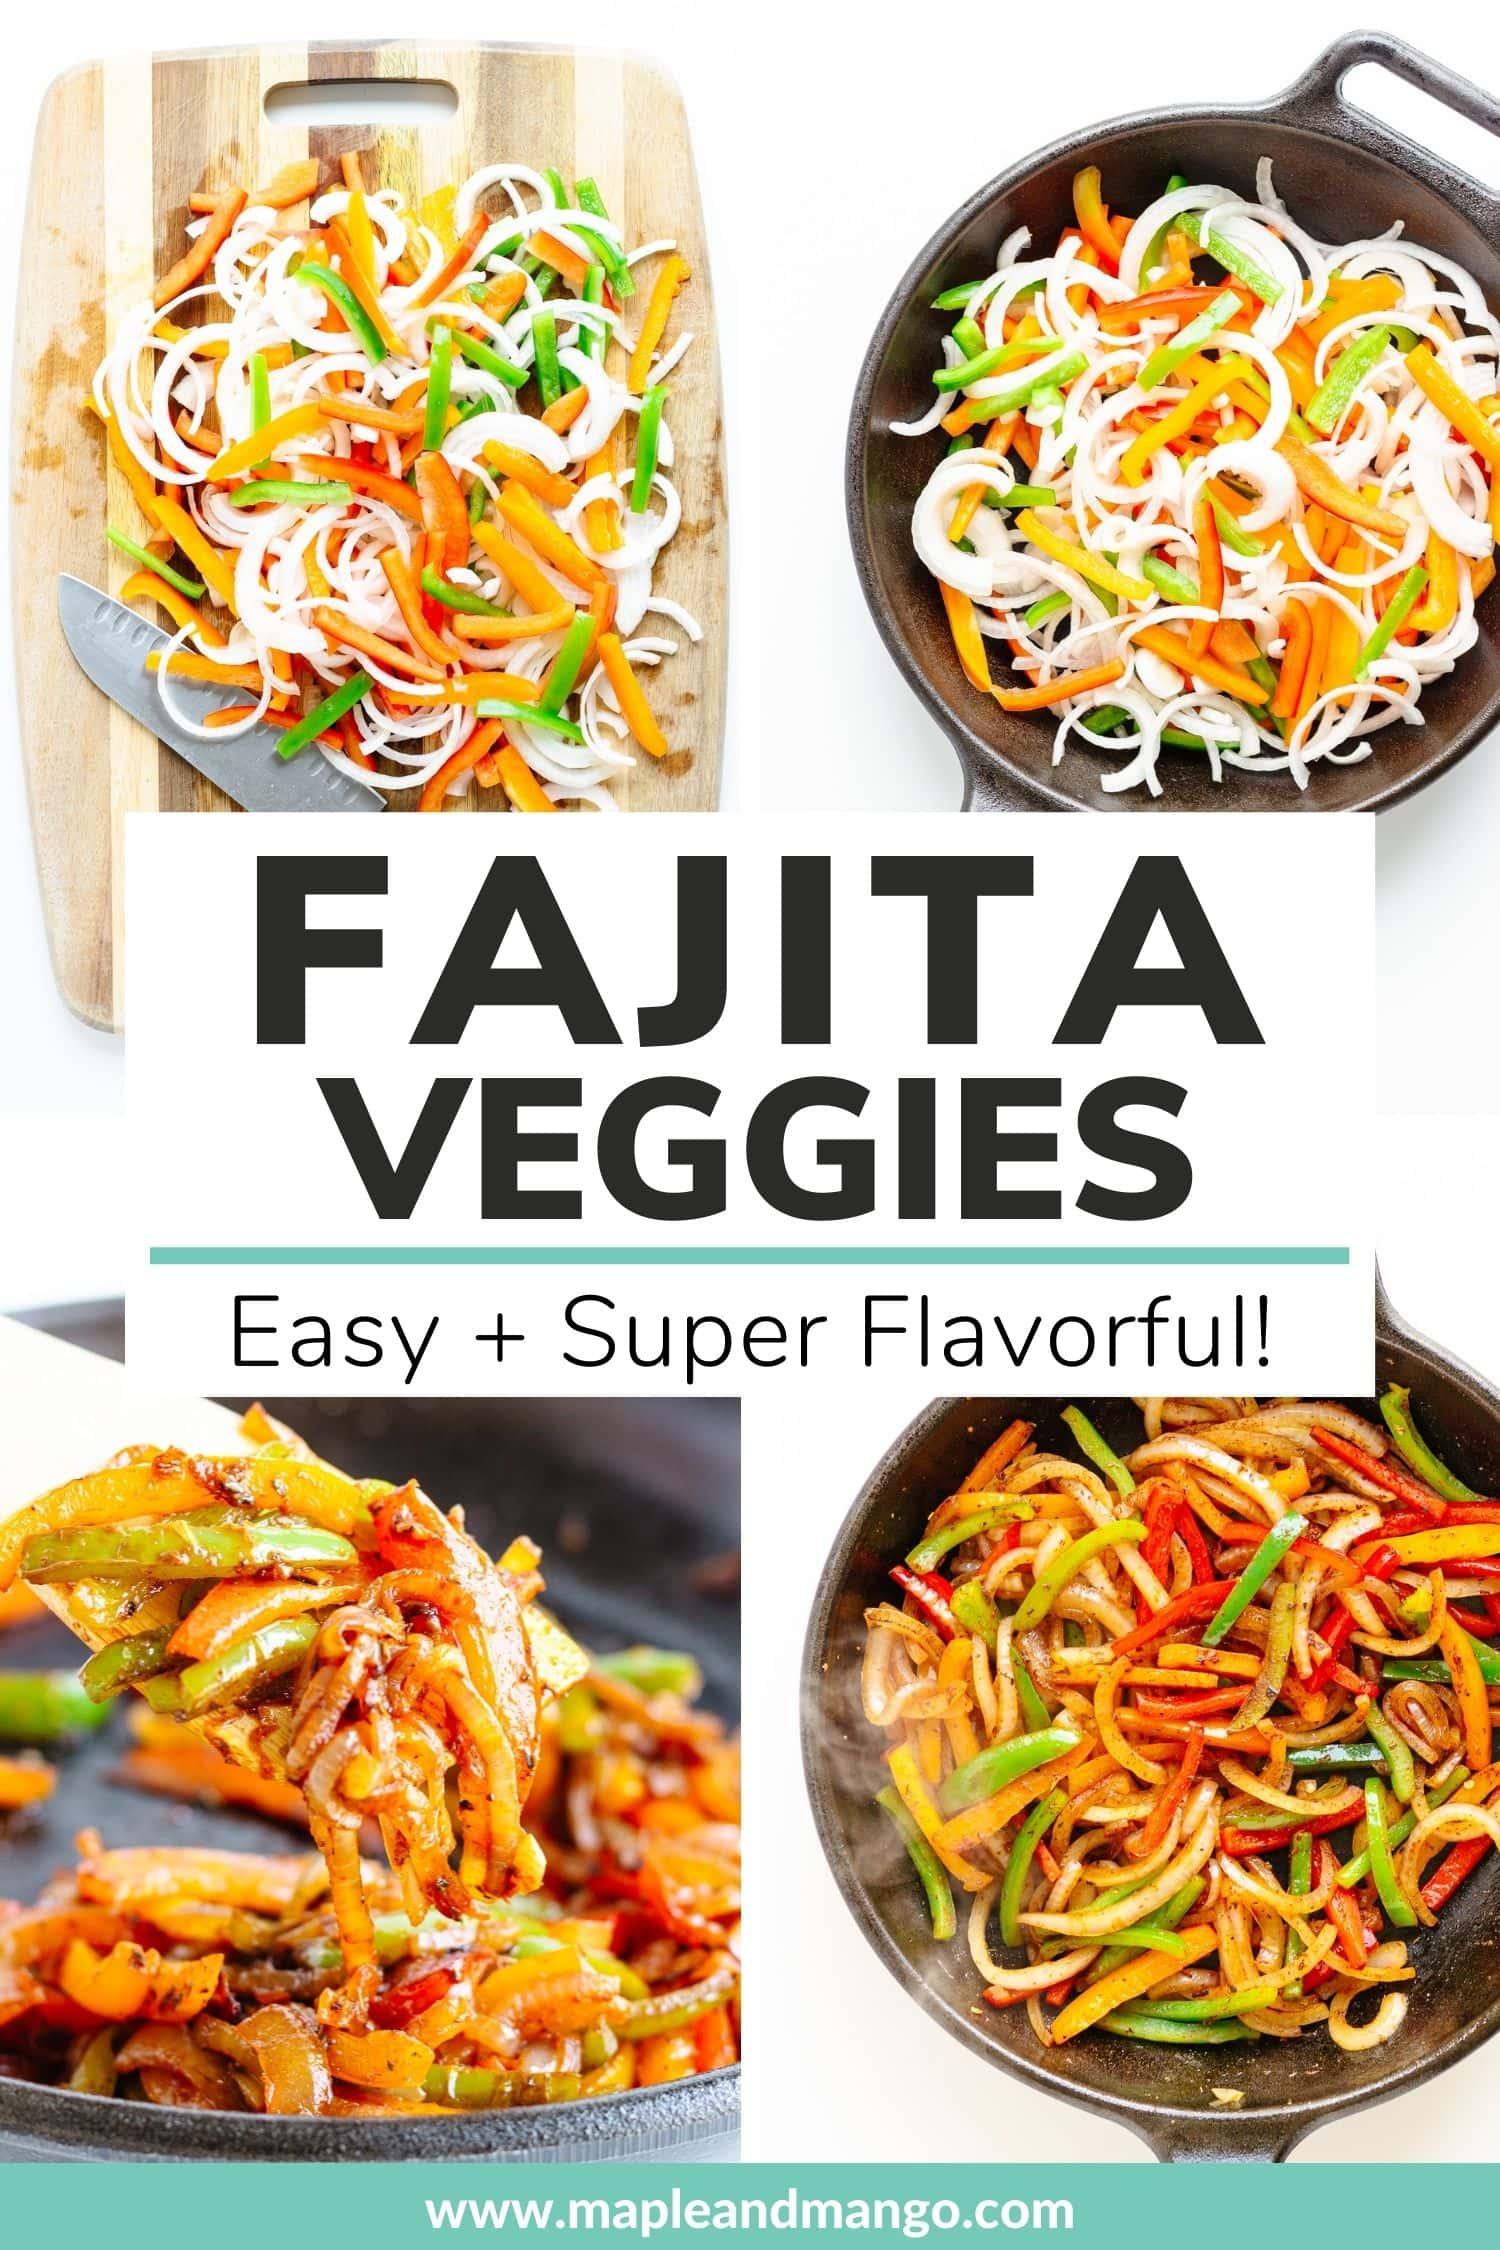 "Photo collage showing fajita veggies with text overlay ""Fajita Veggies: Easy + Super Flavorful!""."